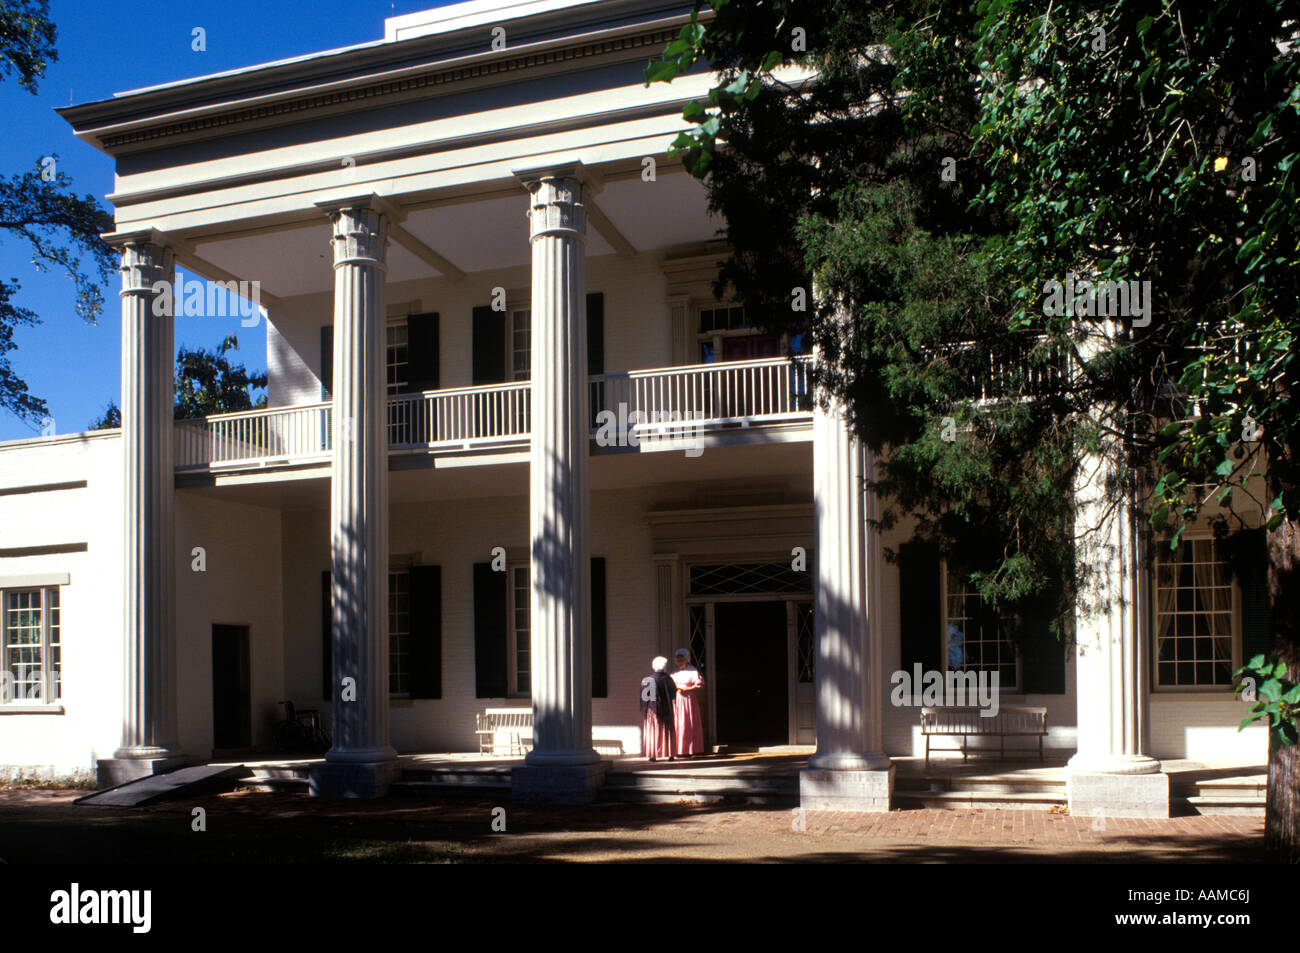 NASHVILLE TN HERMITAGE PLANTATION ACCUEIL DU PRÉSIDENT ANDREW JACKSON Photo Stock